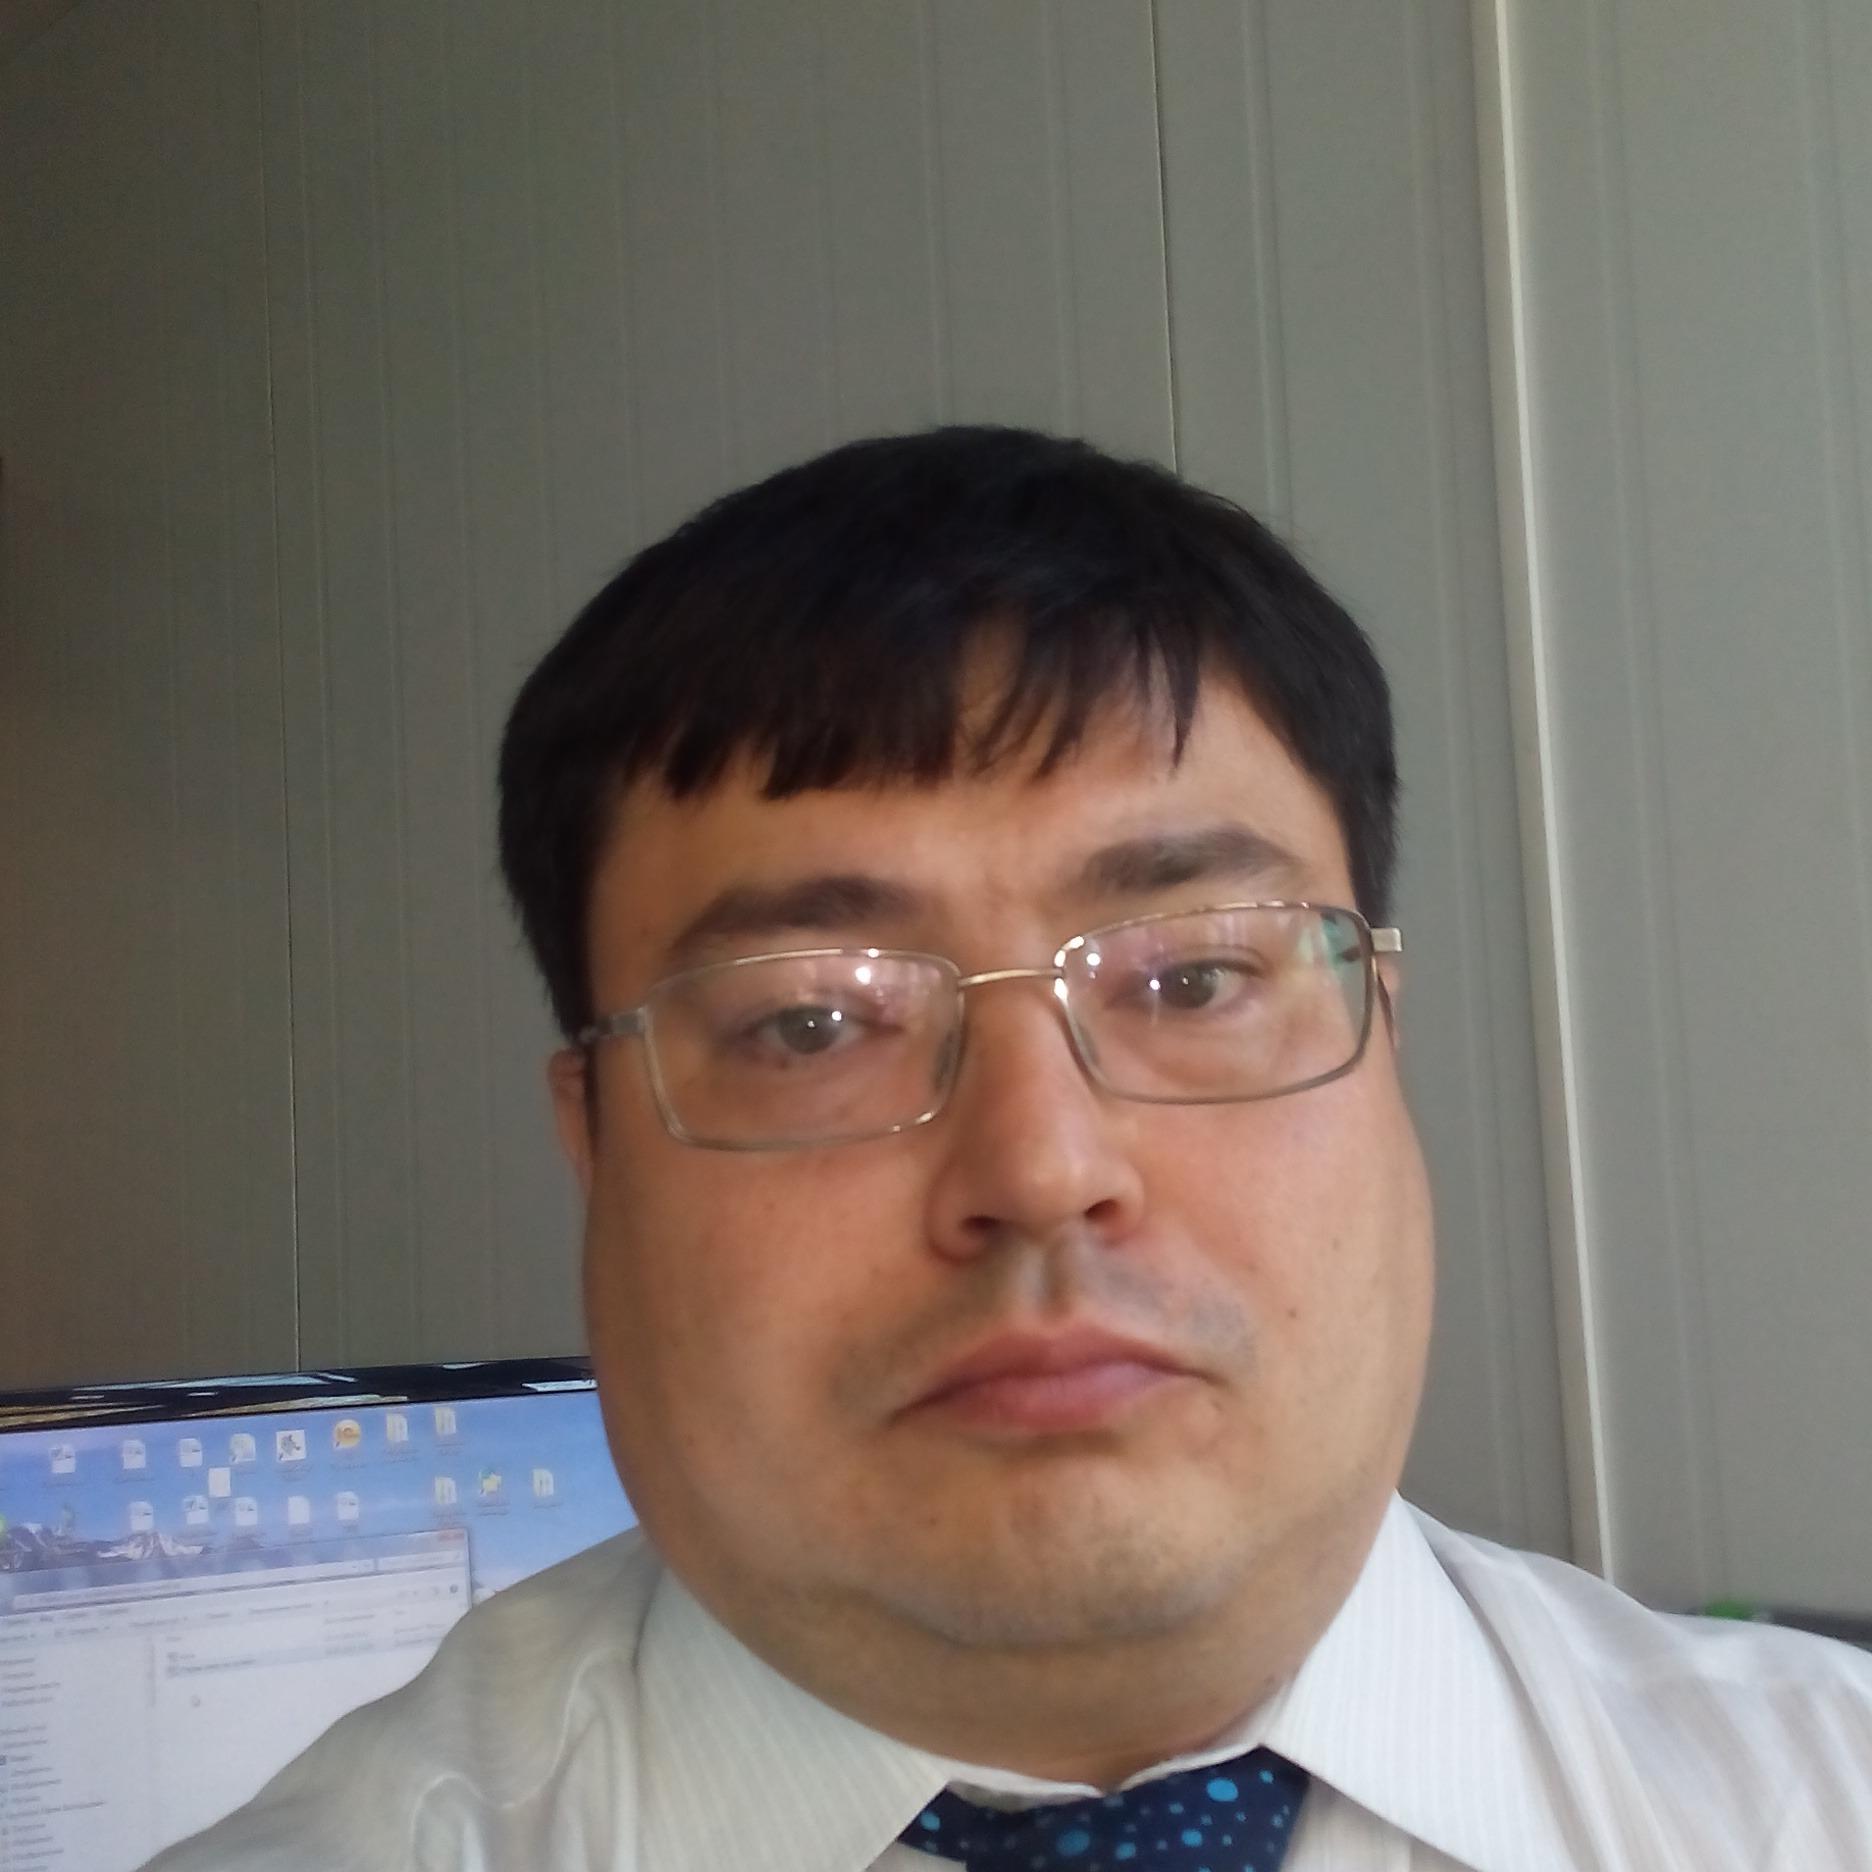 alexanderyusupo